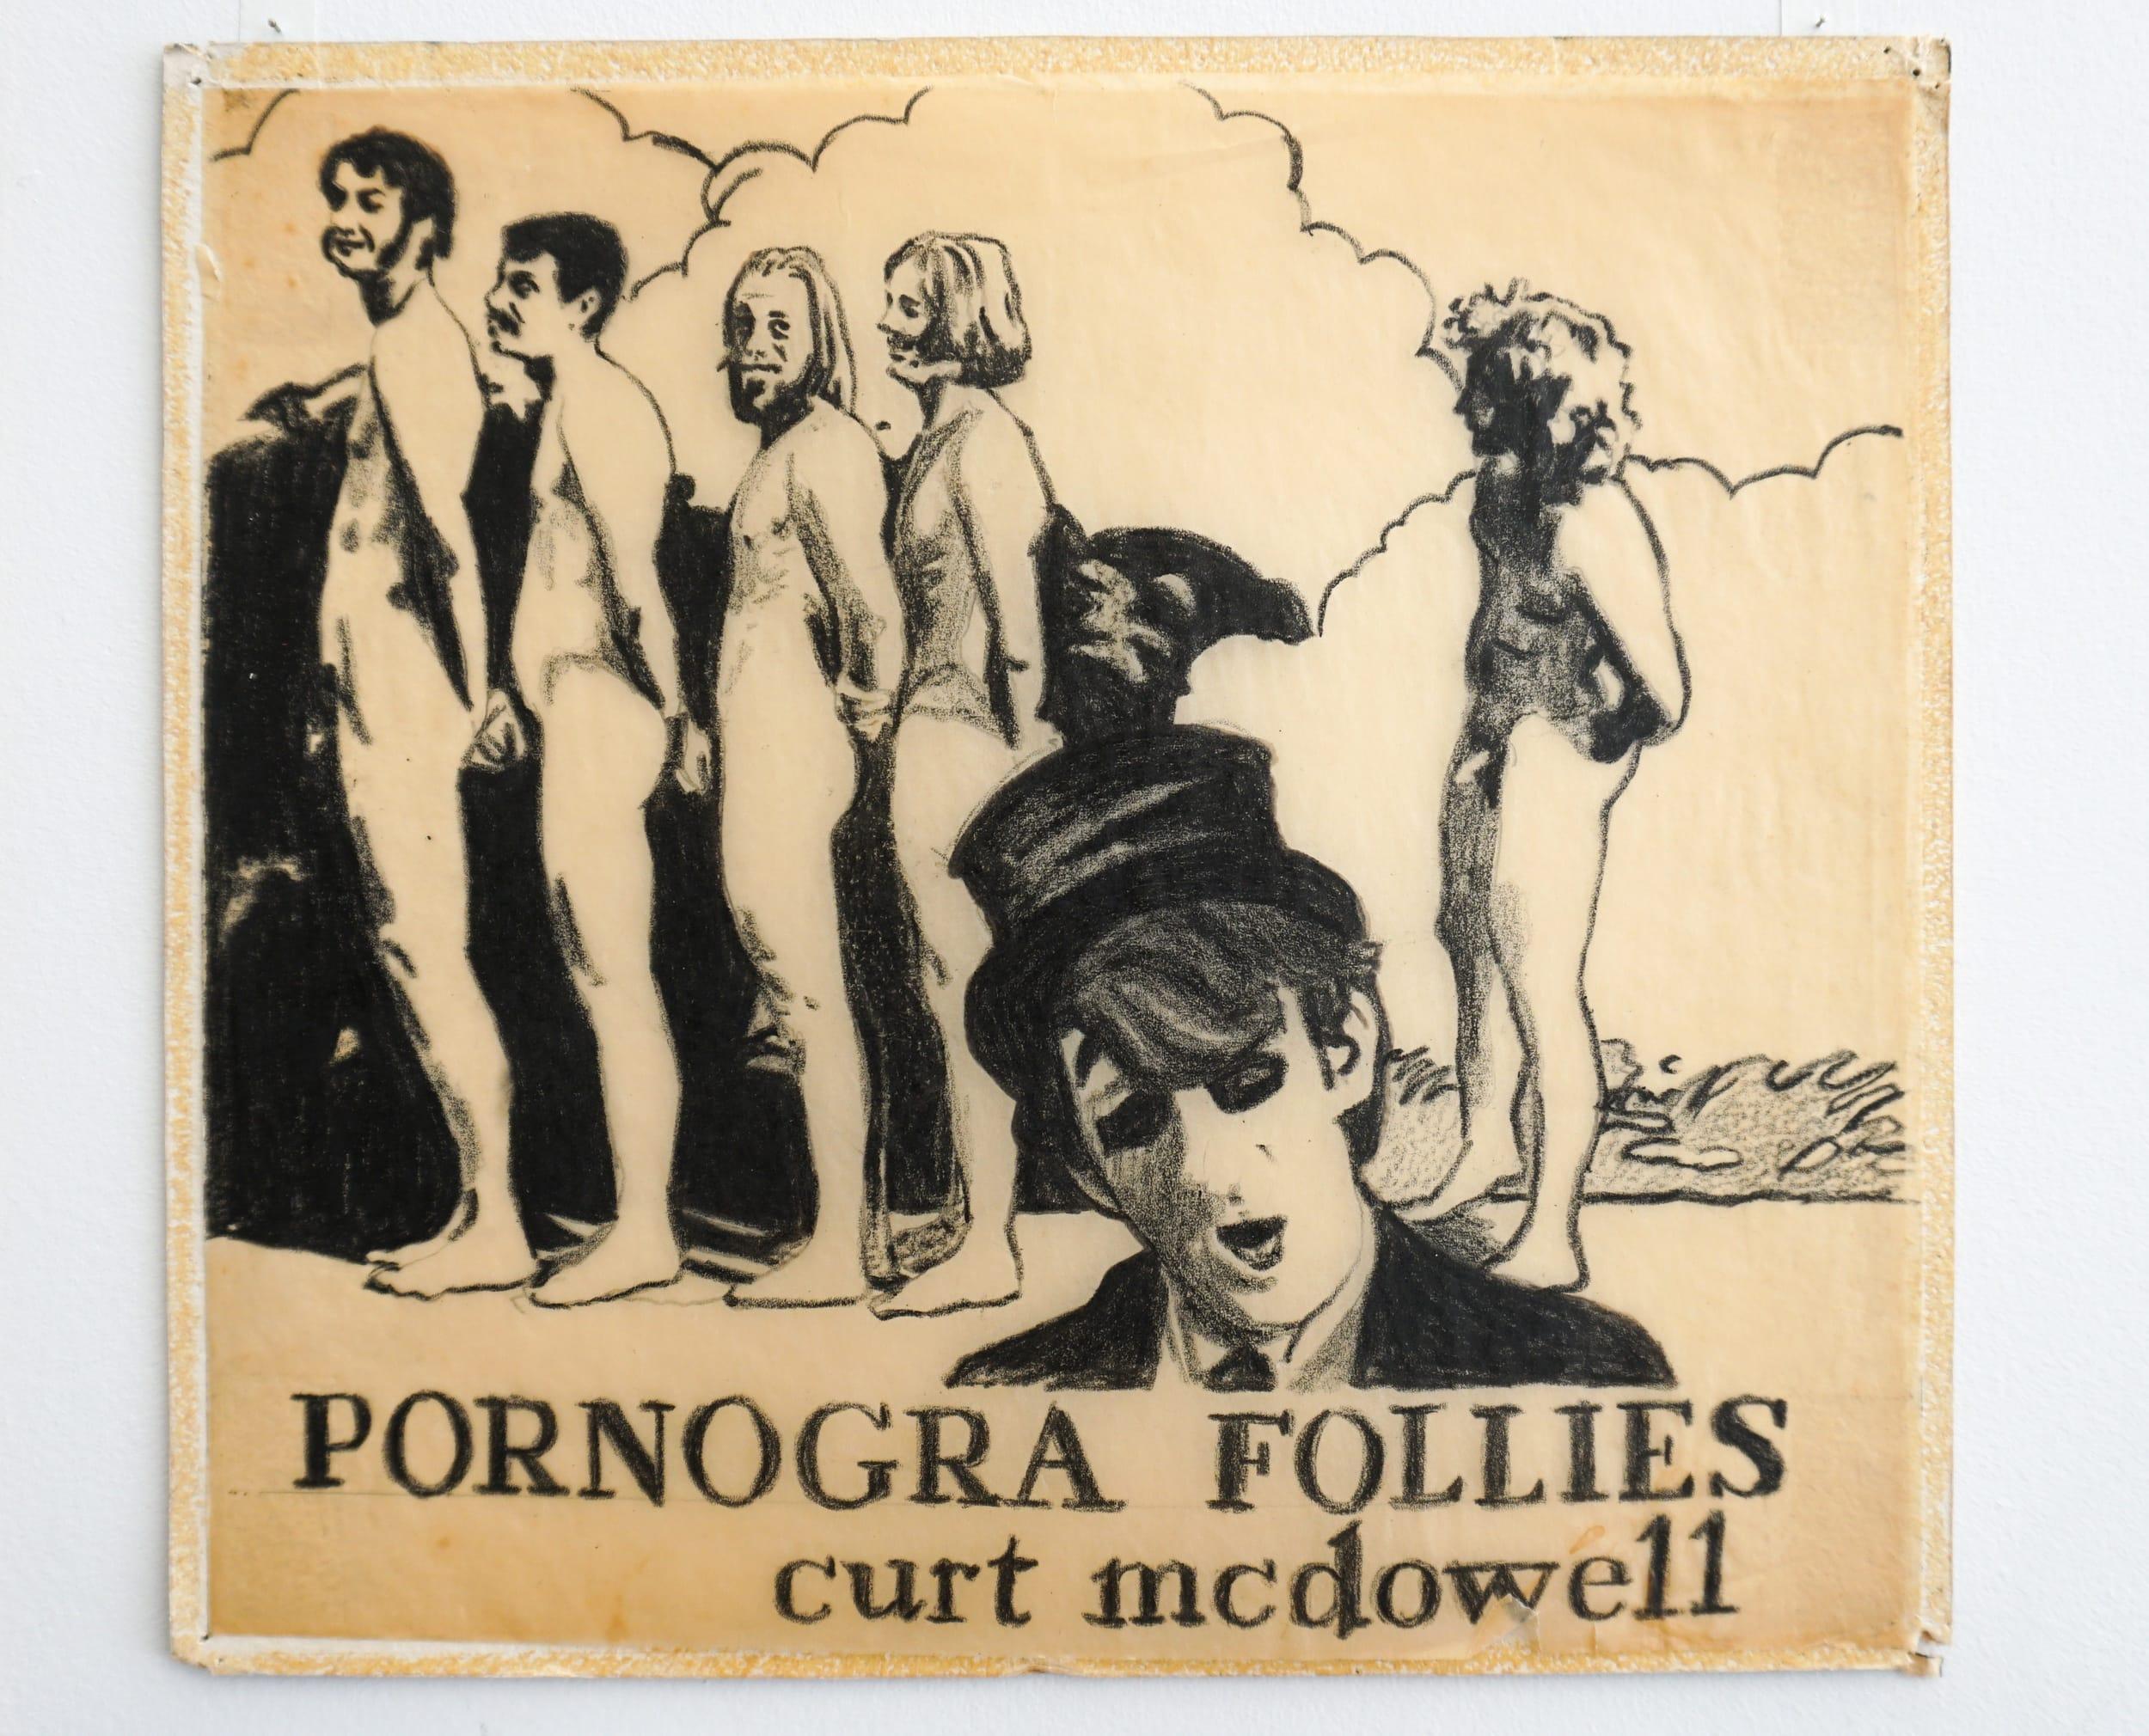 Curt McDowell